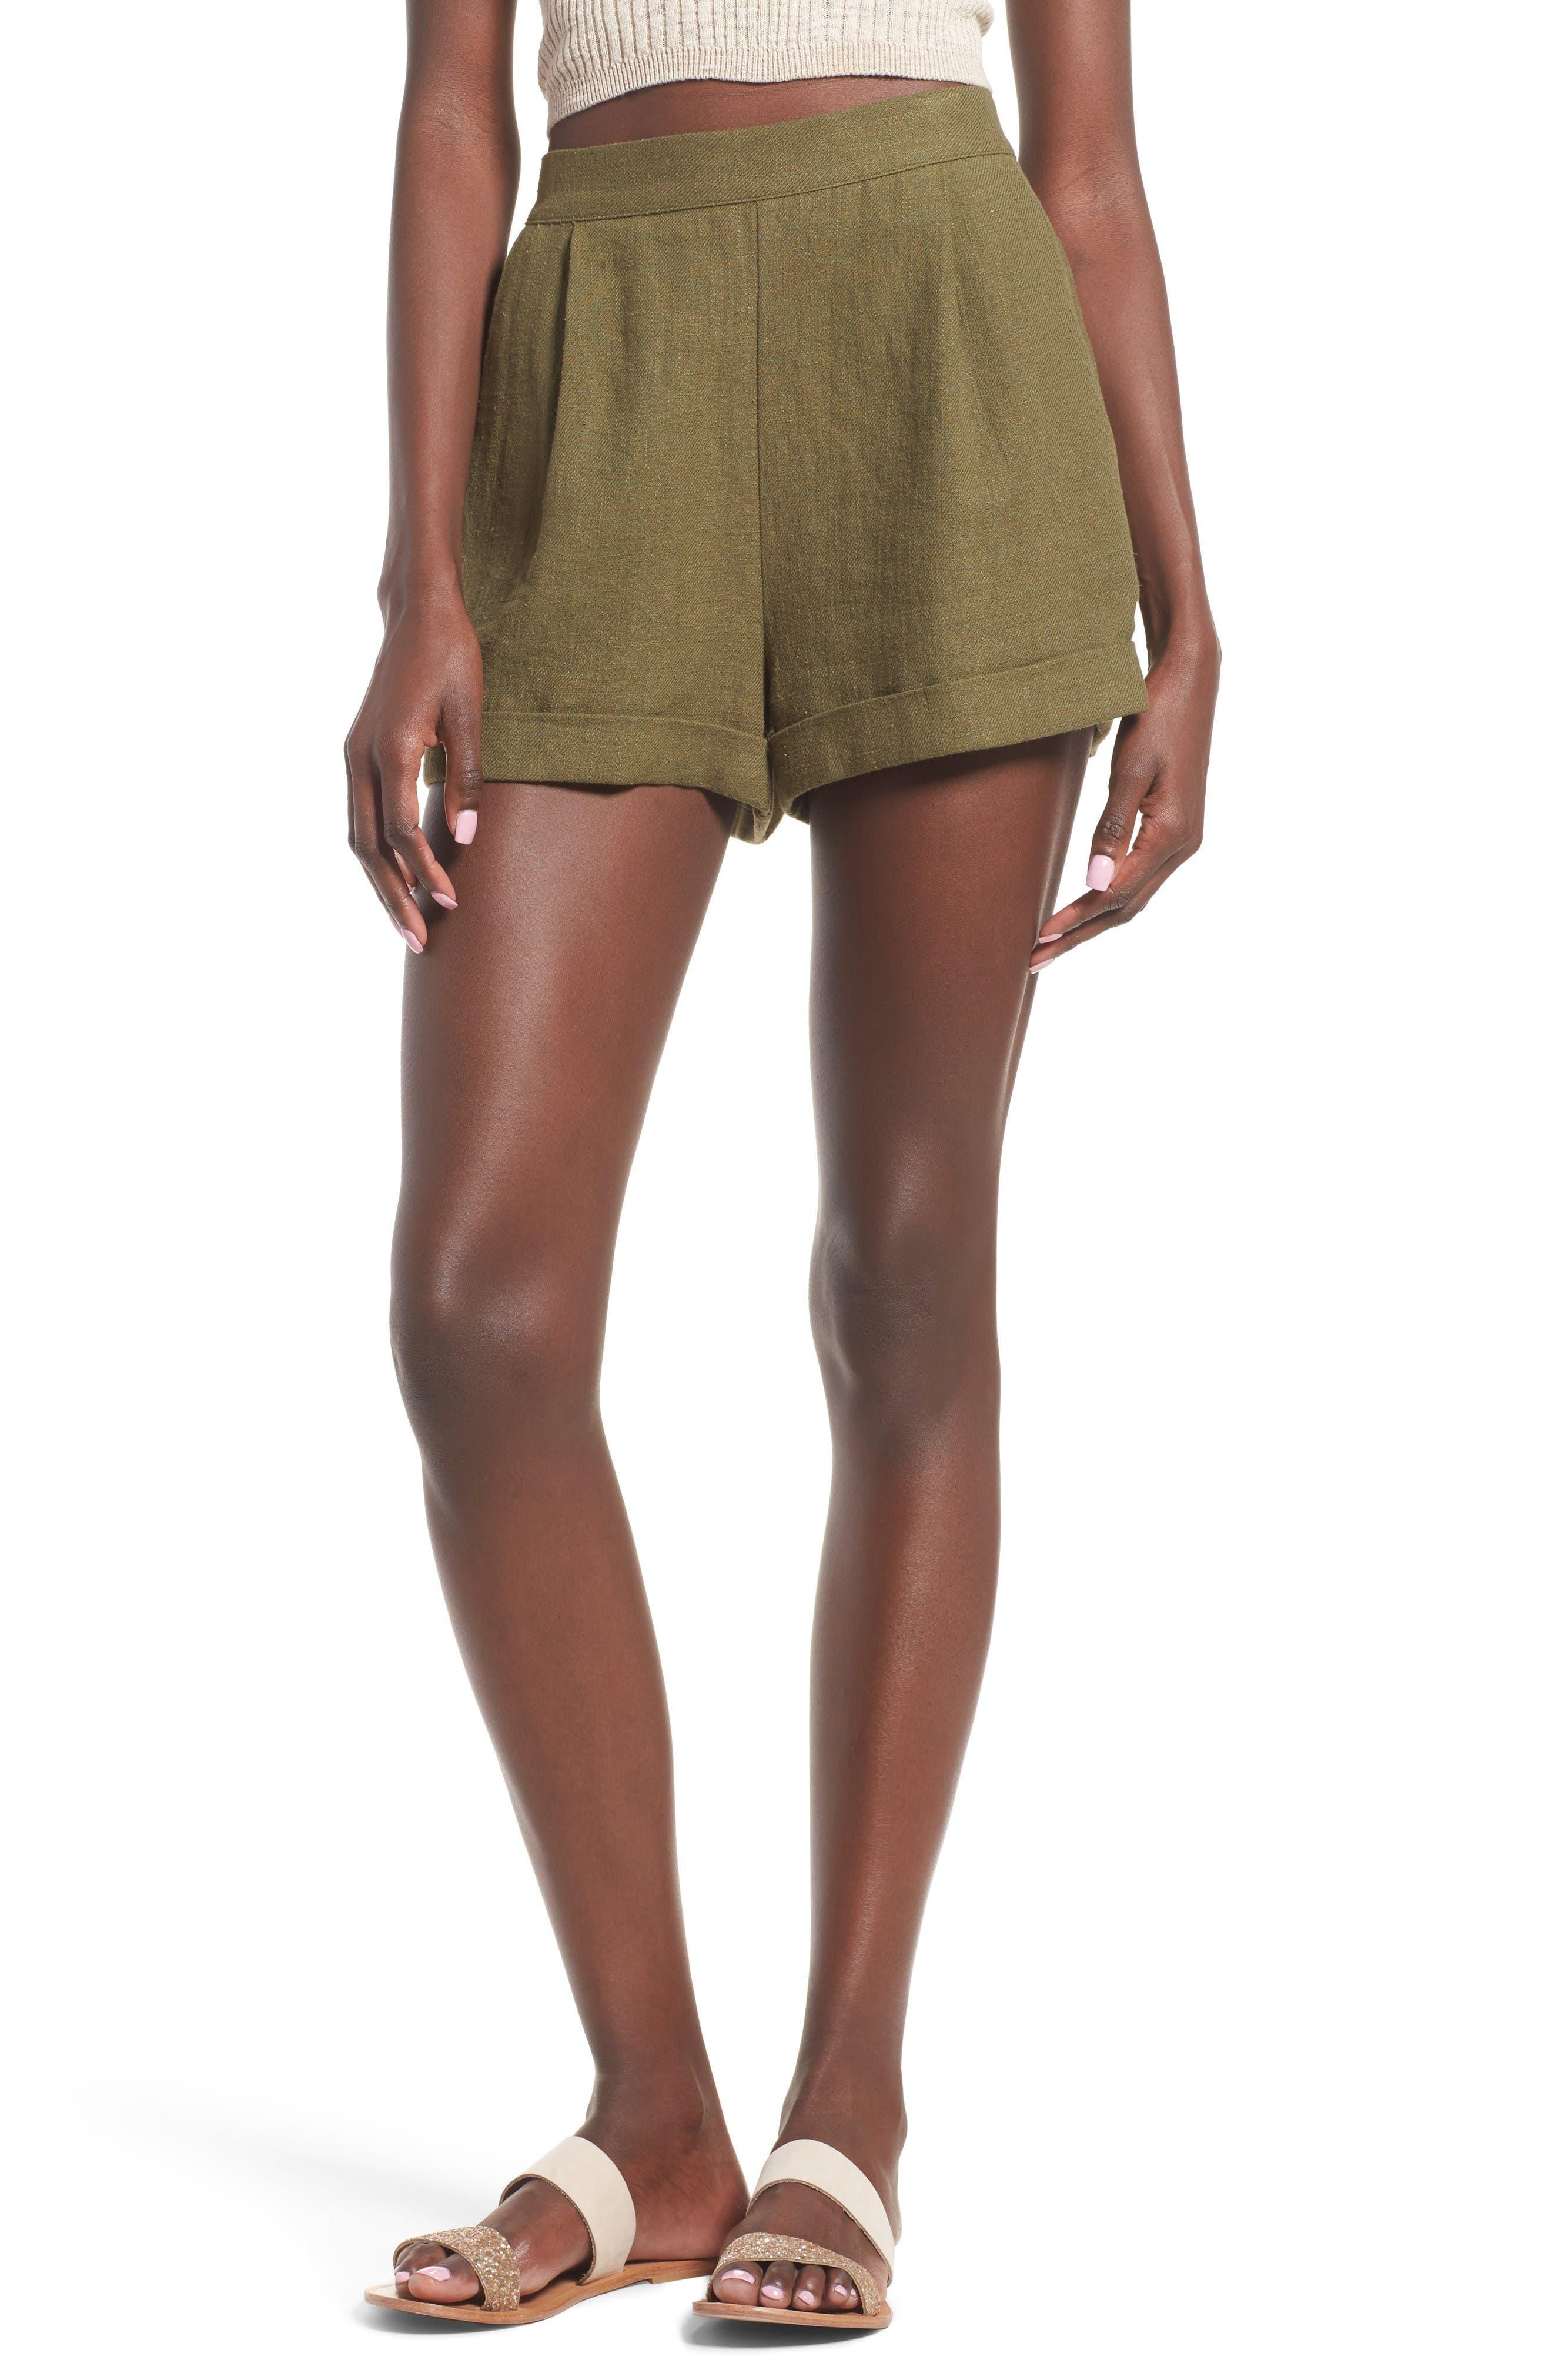 Alternate Image 1 Selected - MOON RIVER High Waist Linen & Cotton Shorts